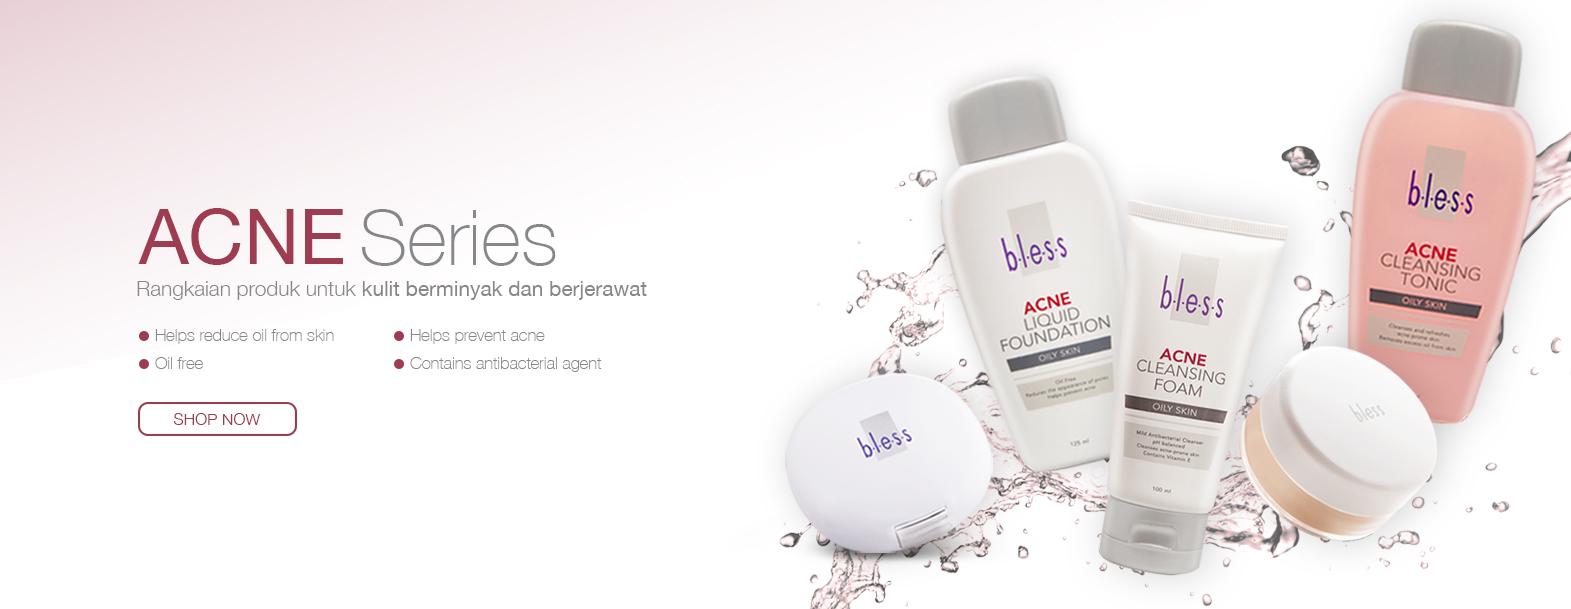 slide-acne-series-1